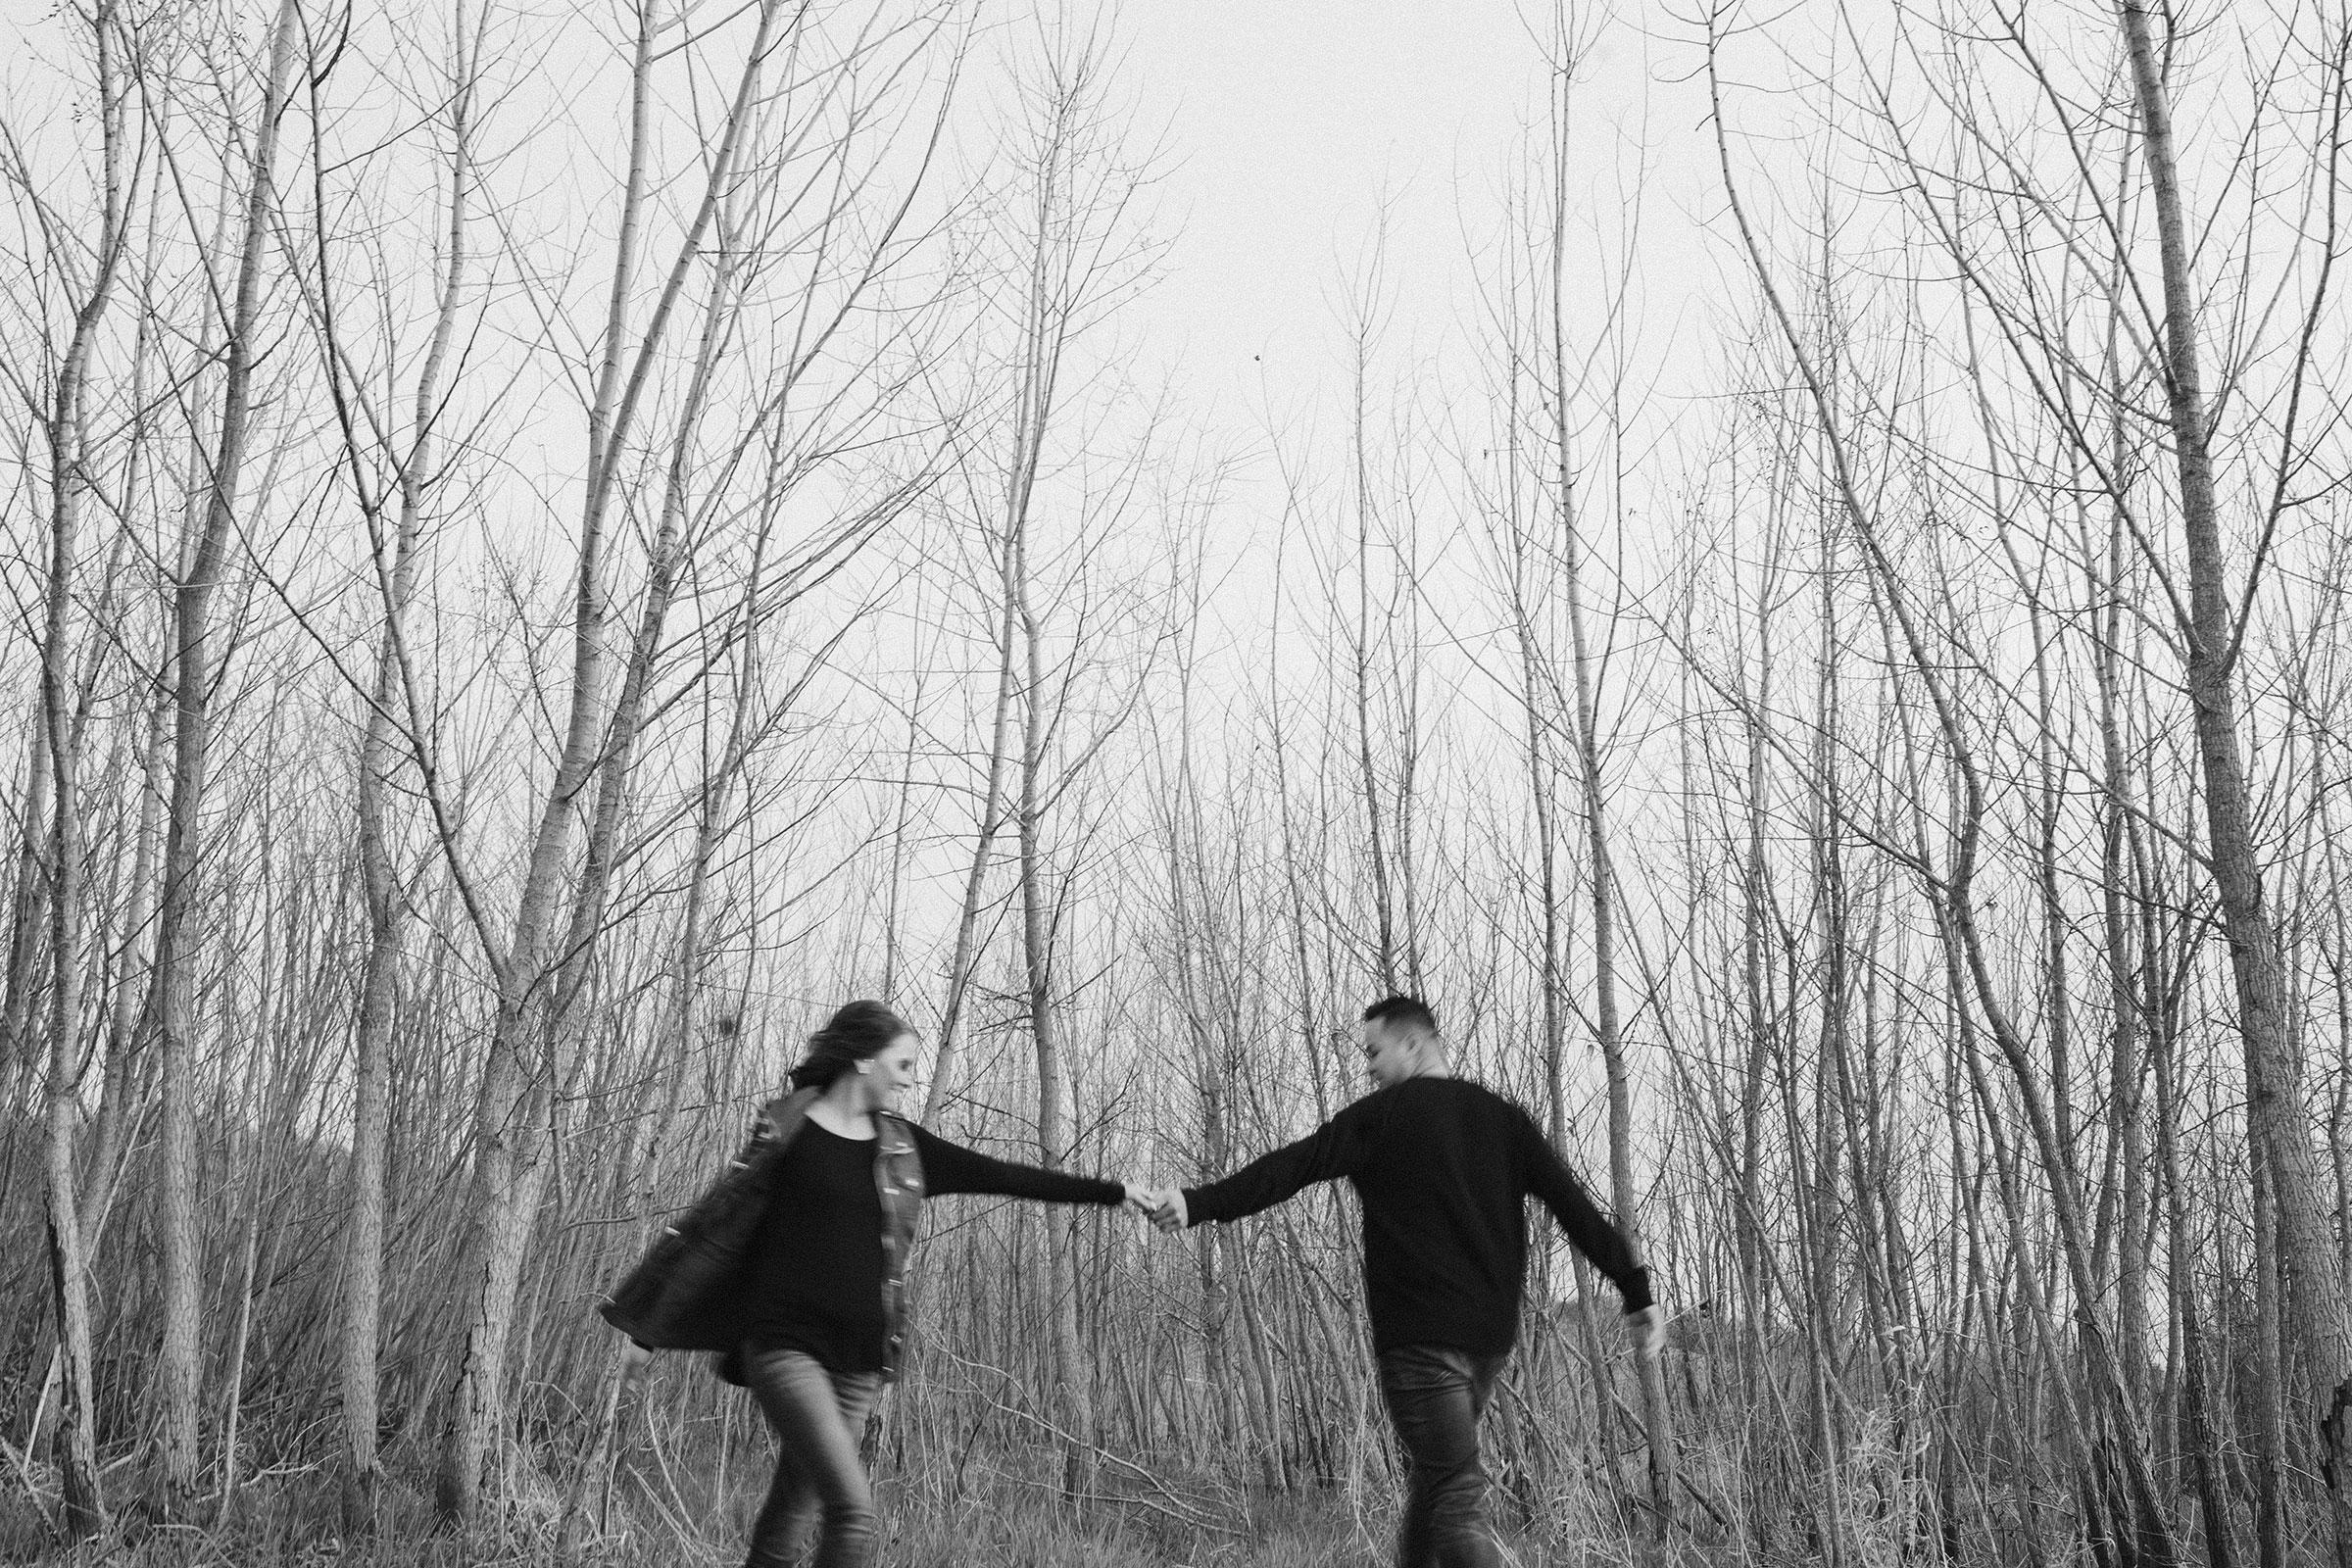 couple-walking-in-circles-in-woods-winterset-iowa-raelyn-ramey-photography.jpg